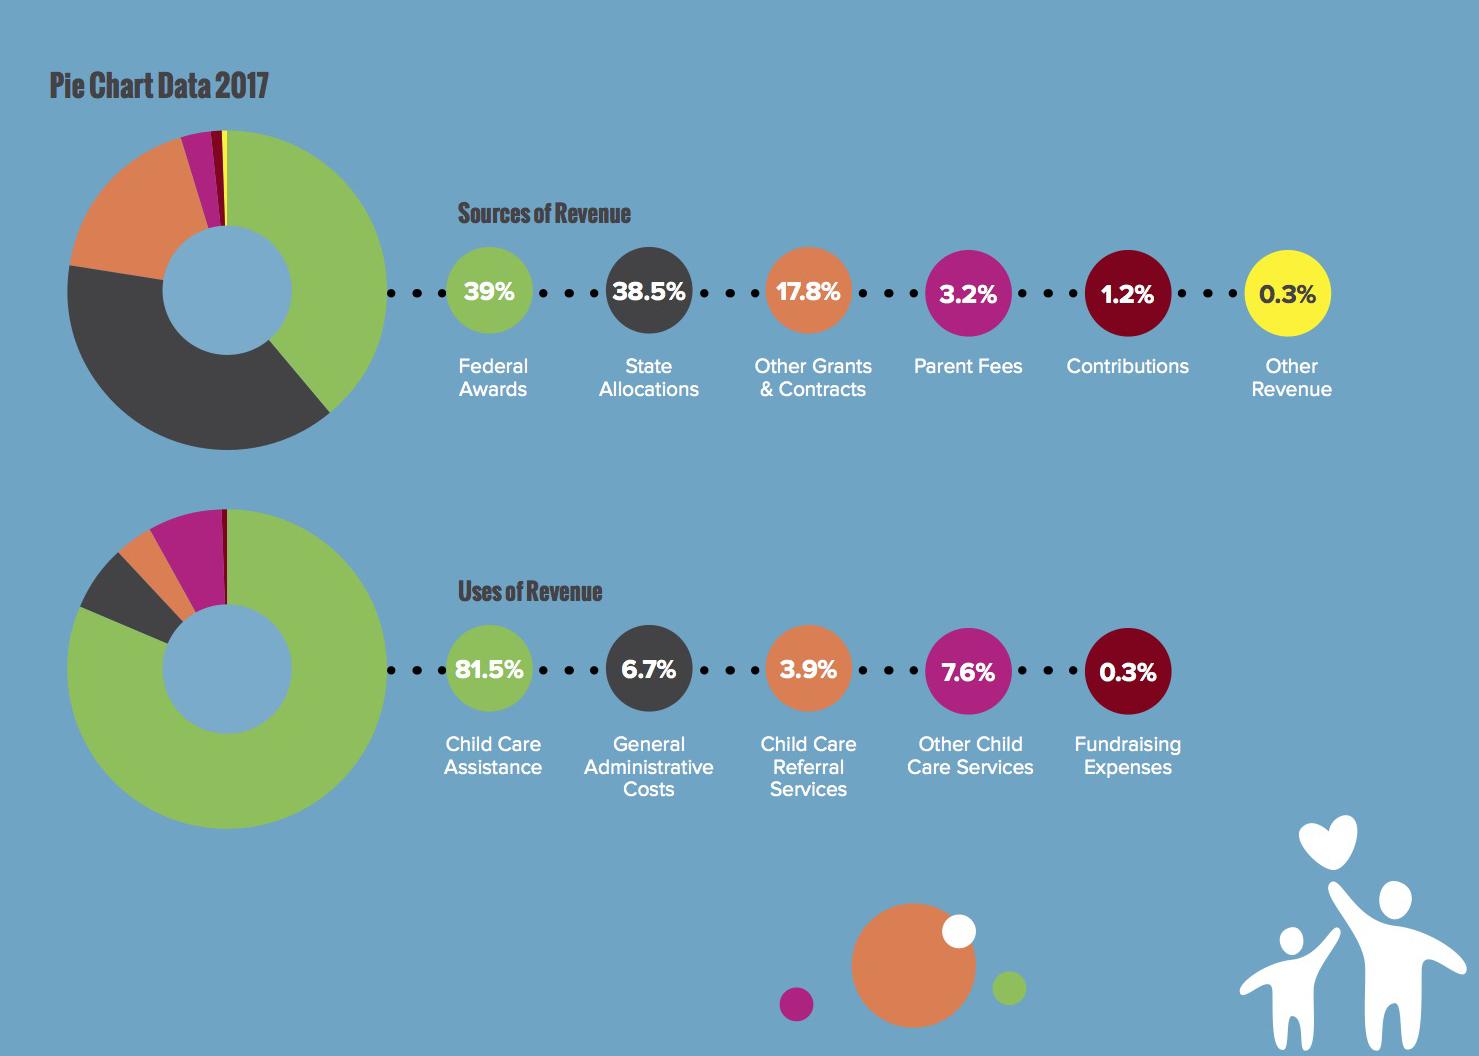 Financials Uses of Revenue Pie Chart 2013